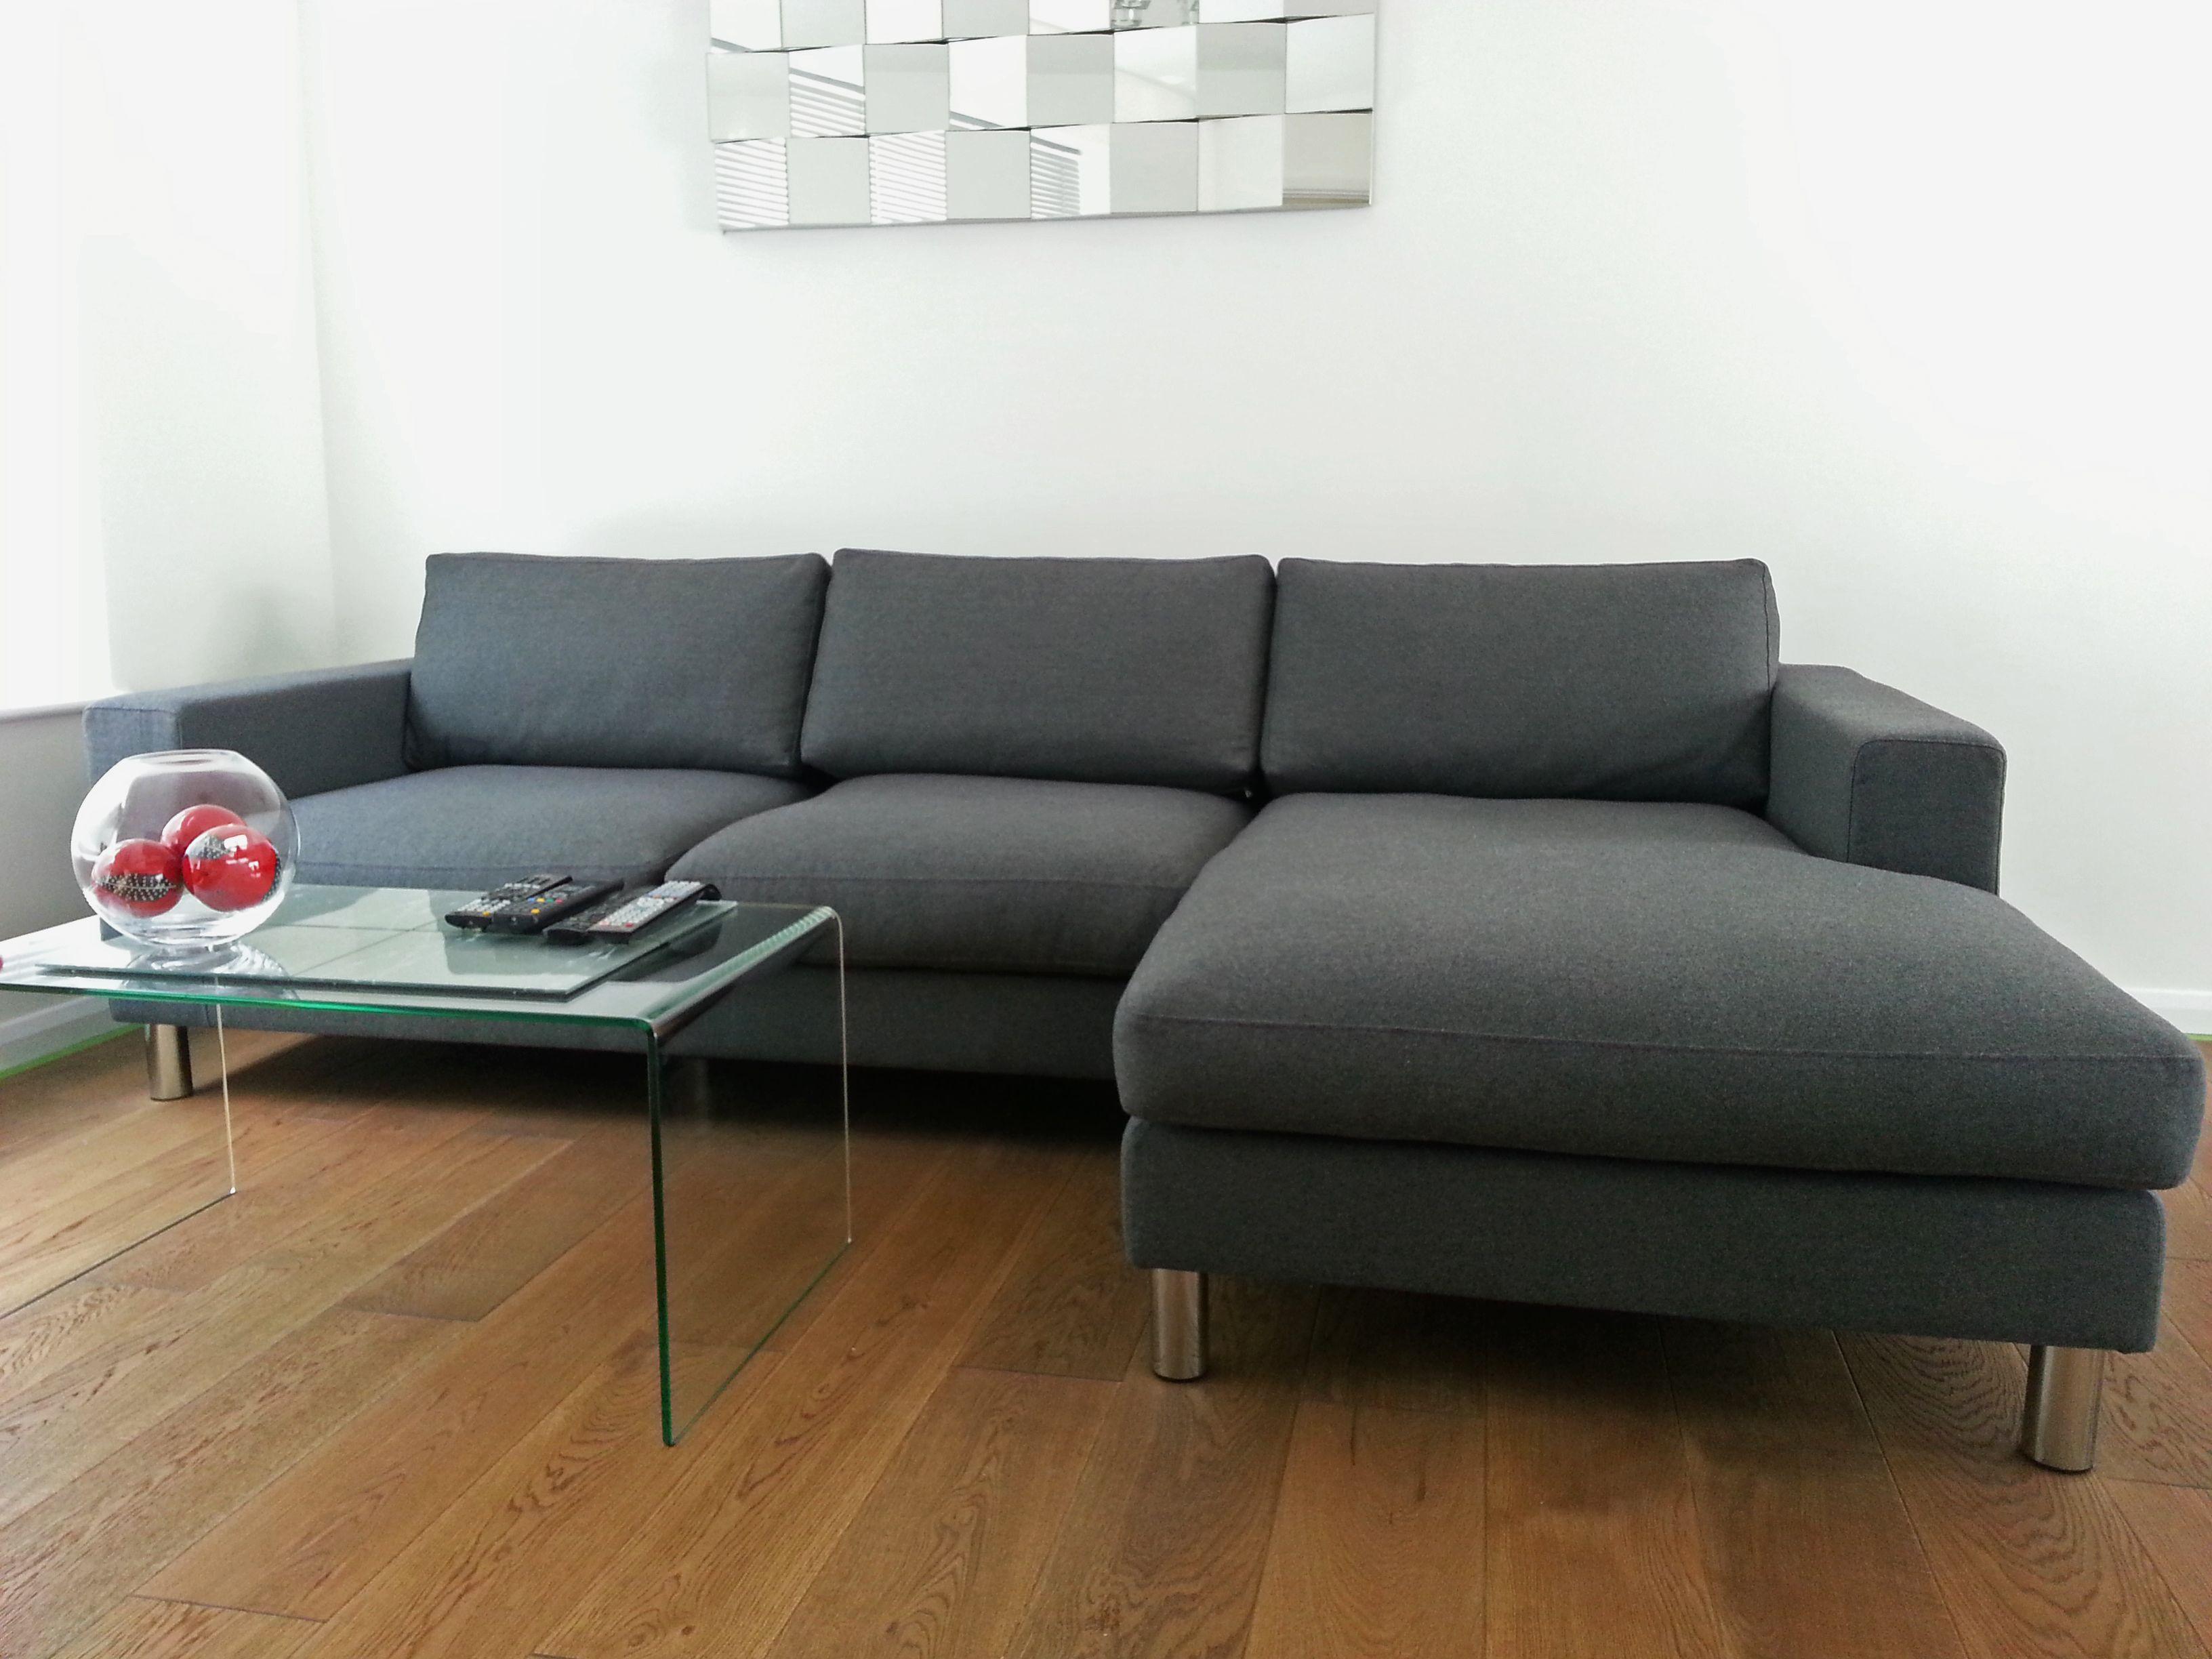 Biki Modern Corner Sofa Photo Sent By Aggy From Bristol You Can Purchase